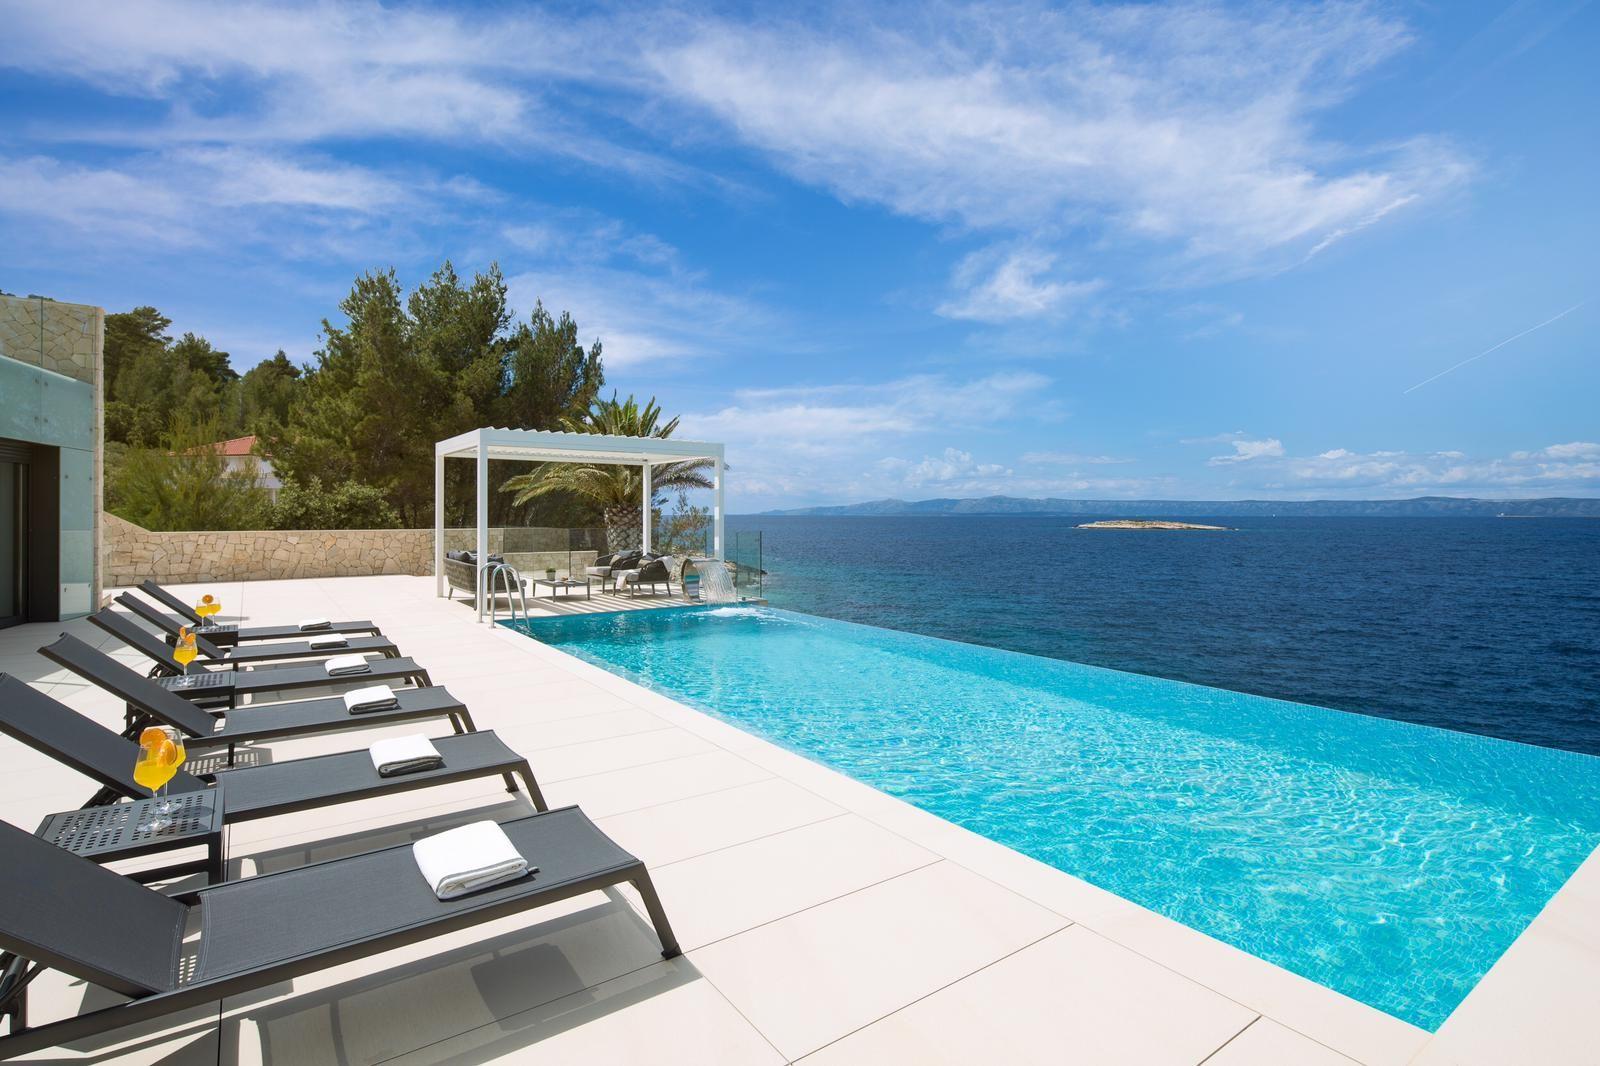 Luxury Villa Palma de Korkyra with Infinity Pool